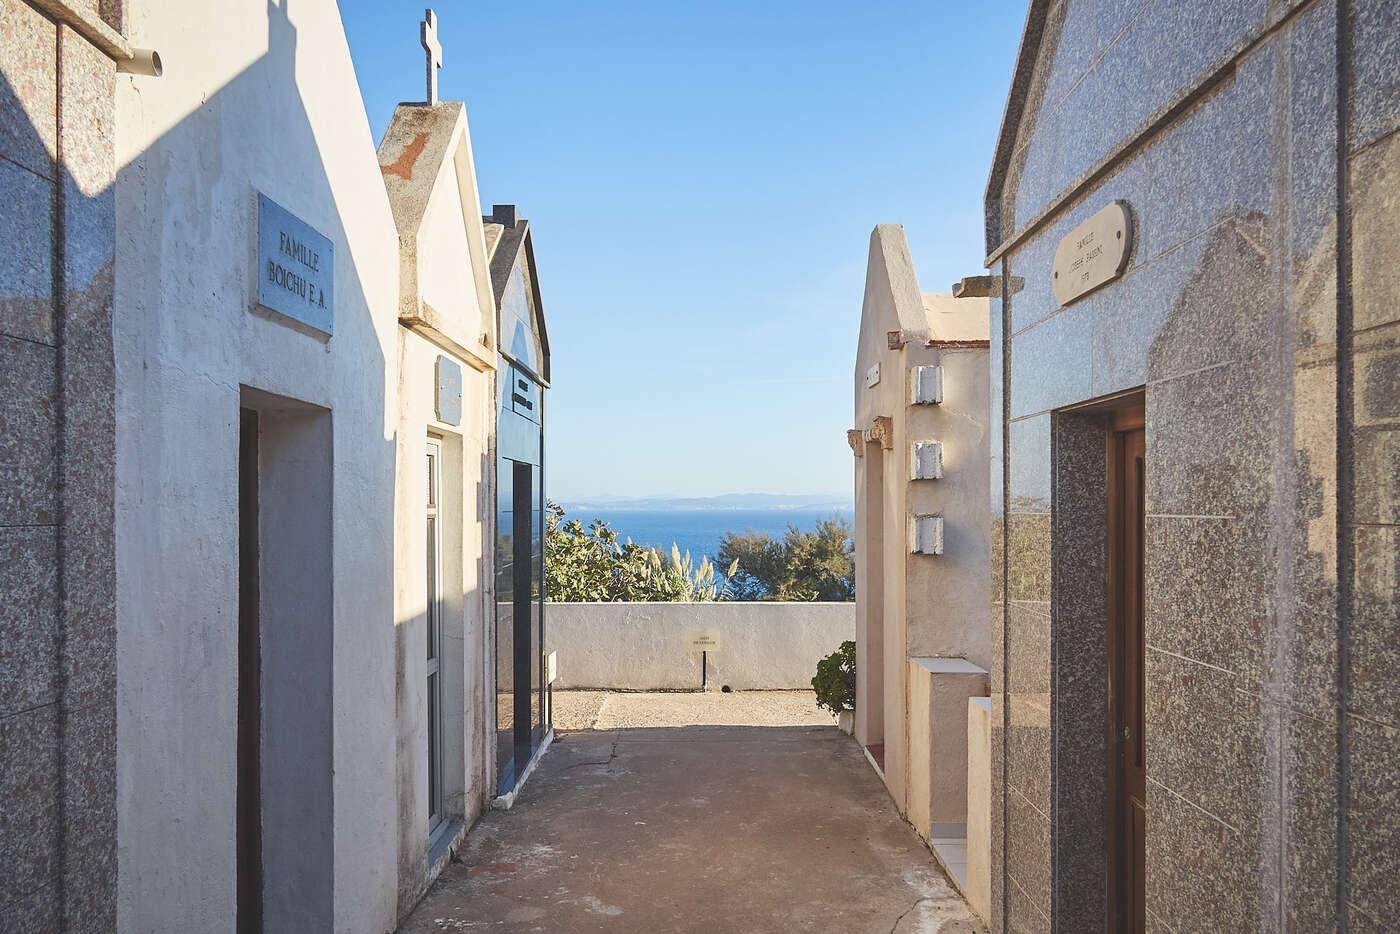 Cimetière de Bonifacio, Corse